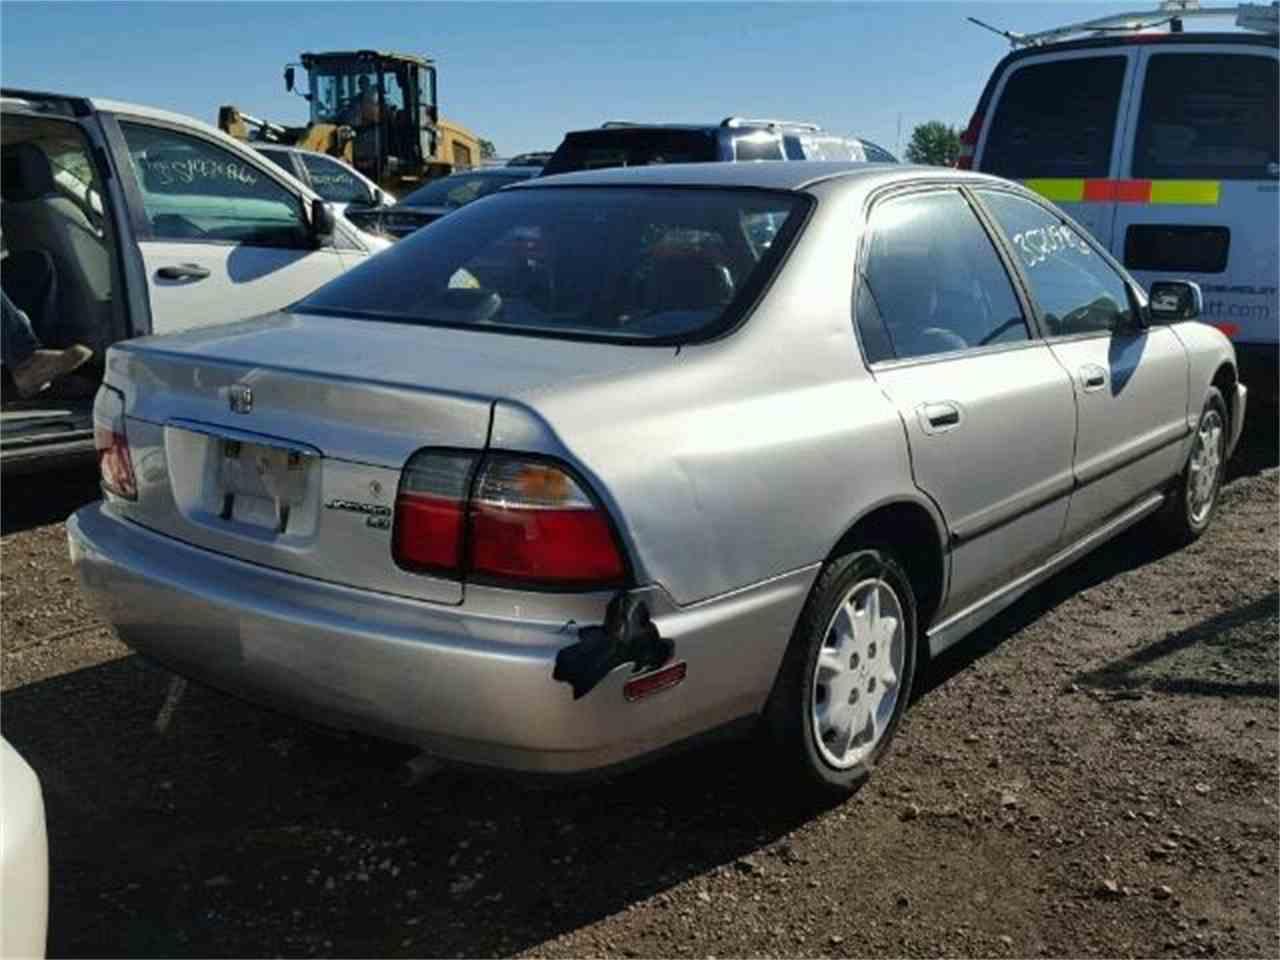 Honda honda accord 1996 : 1996 Honda Accord for Sale | ClassicCars.com | CC-941230